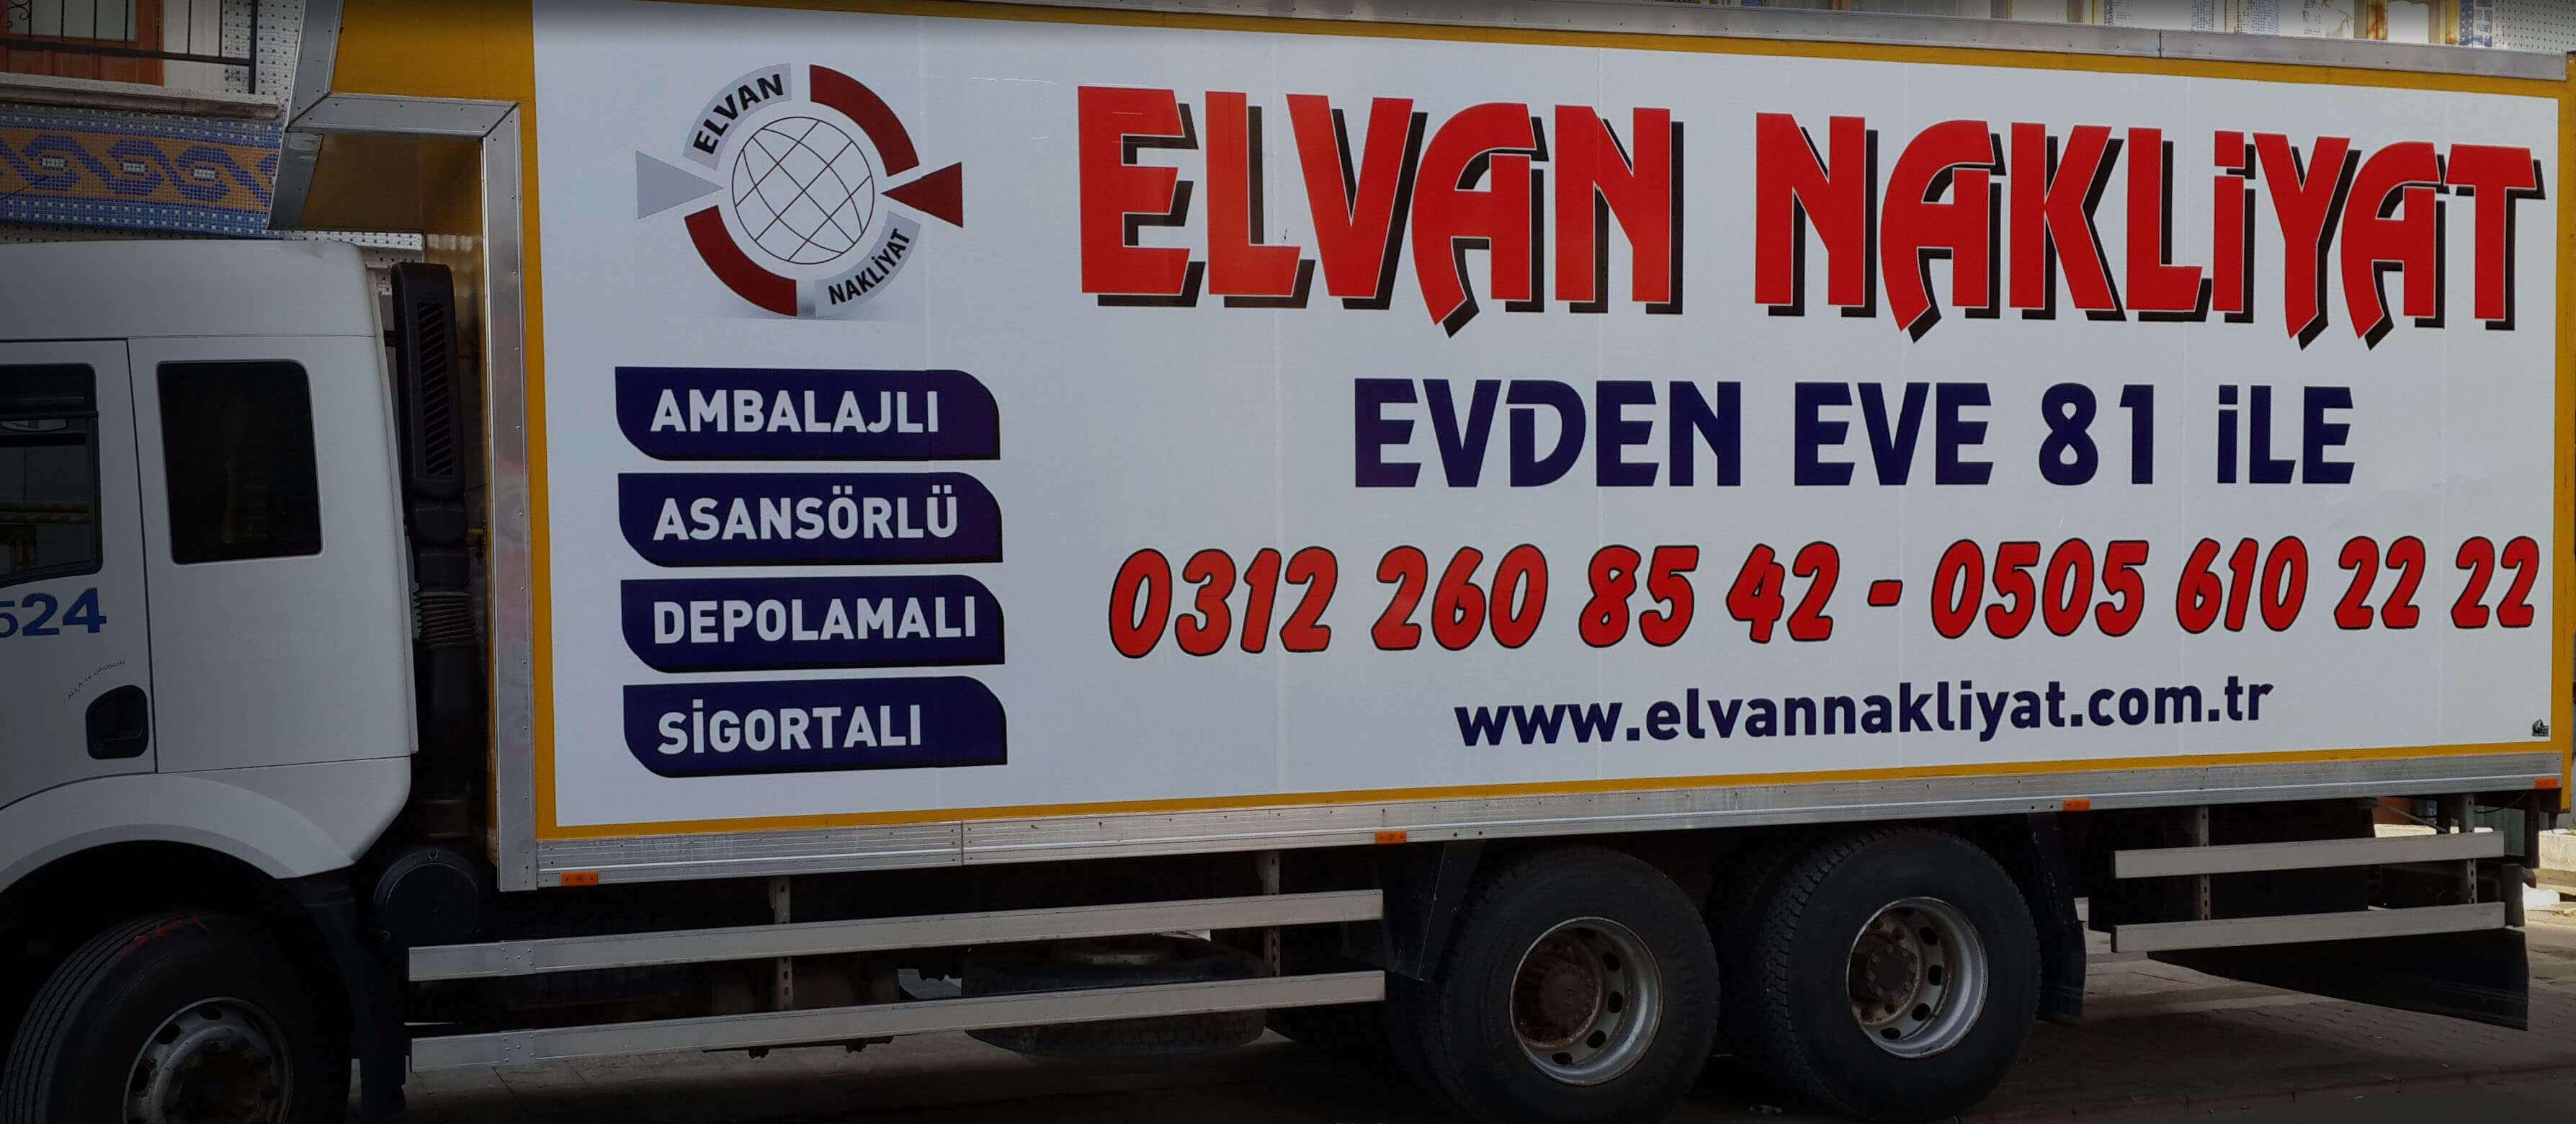 elvan-nakliyat